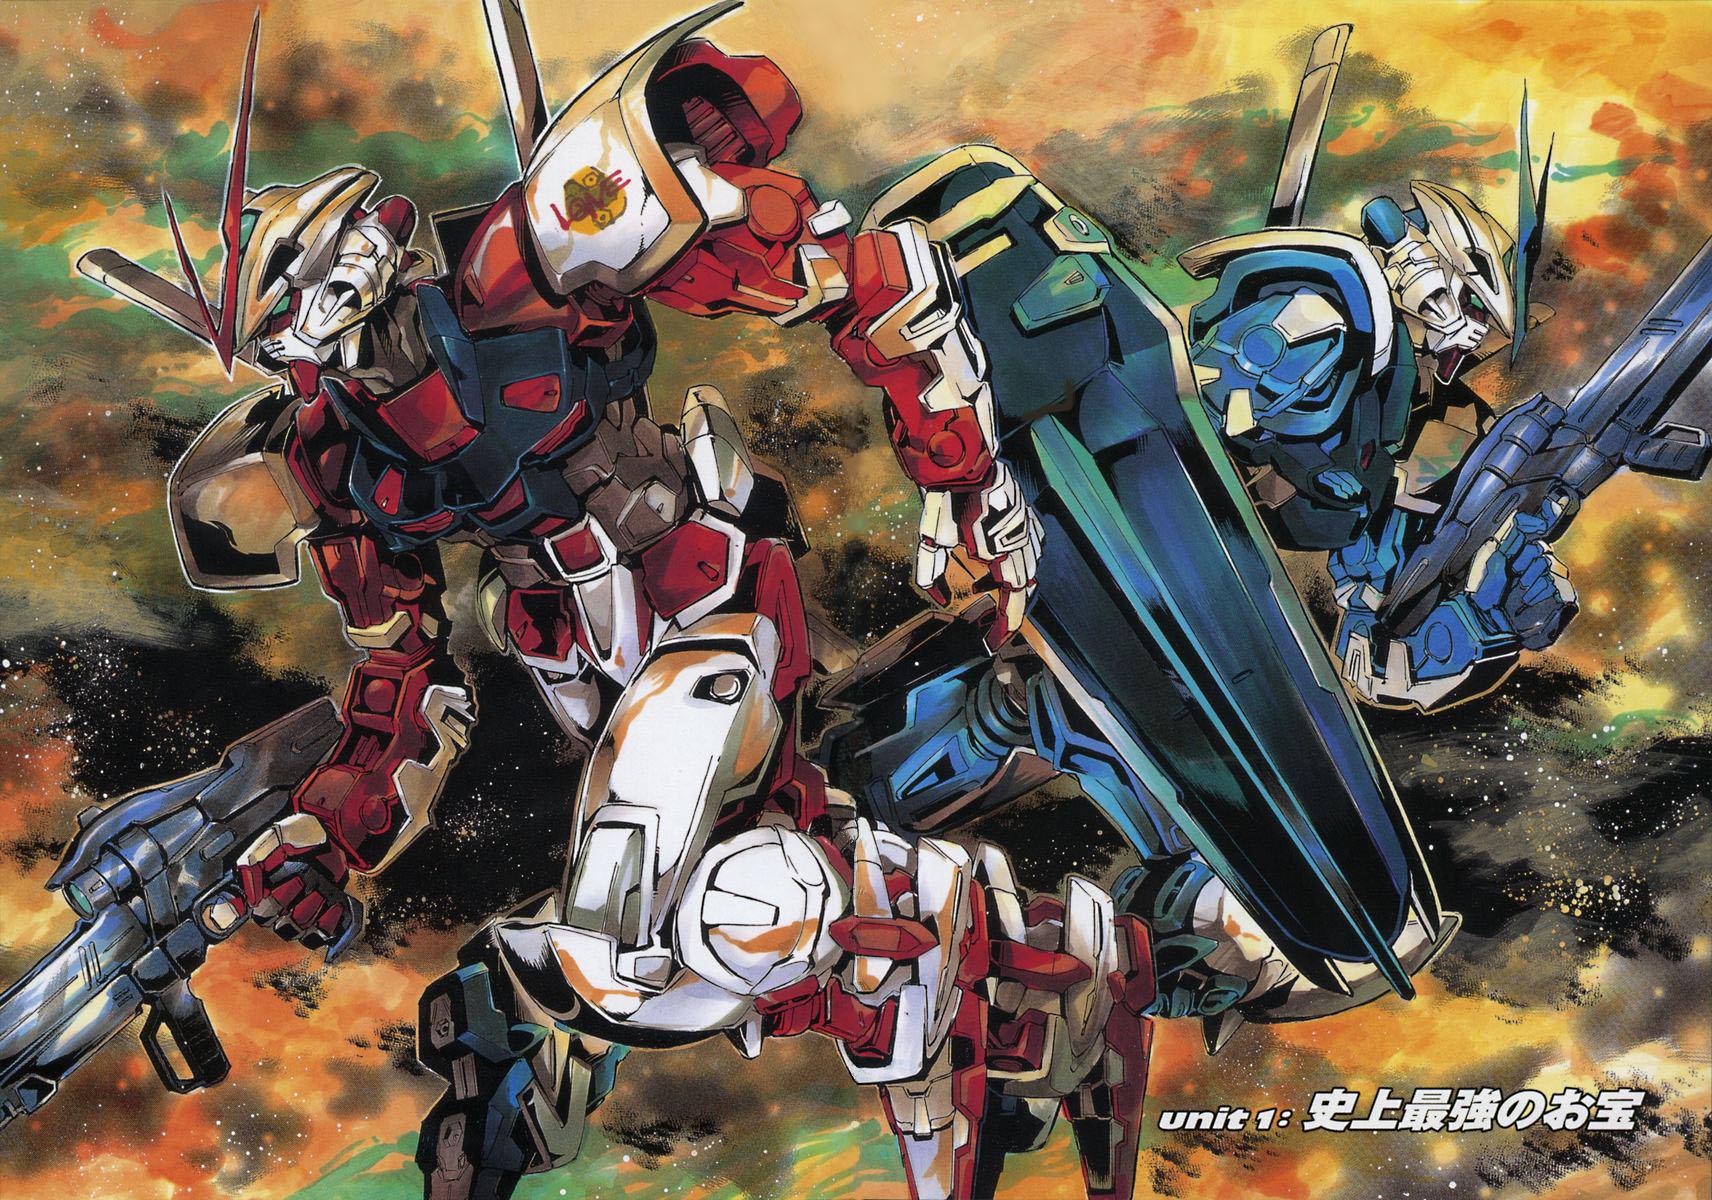 Fairy Tail Girls Wallpapers Gundam Astray 33 Anime Background Animewp Com